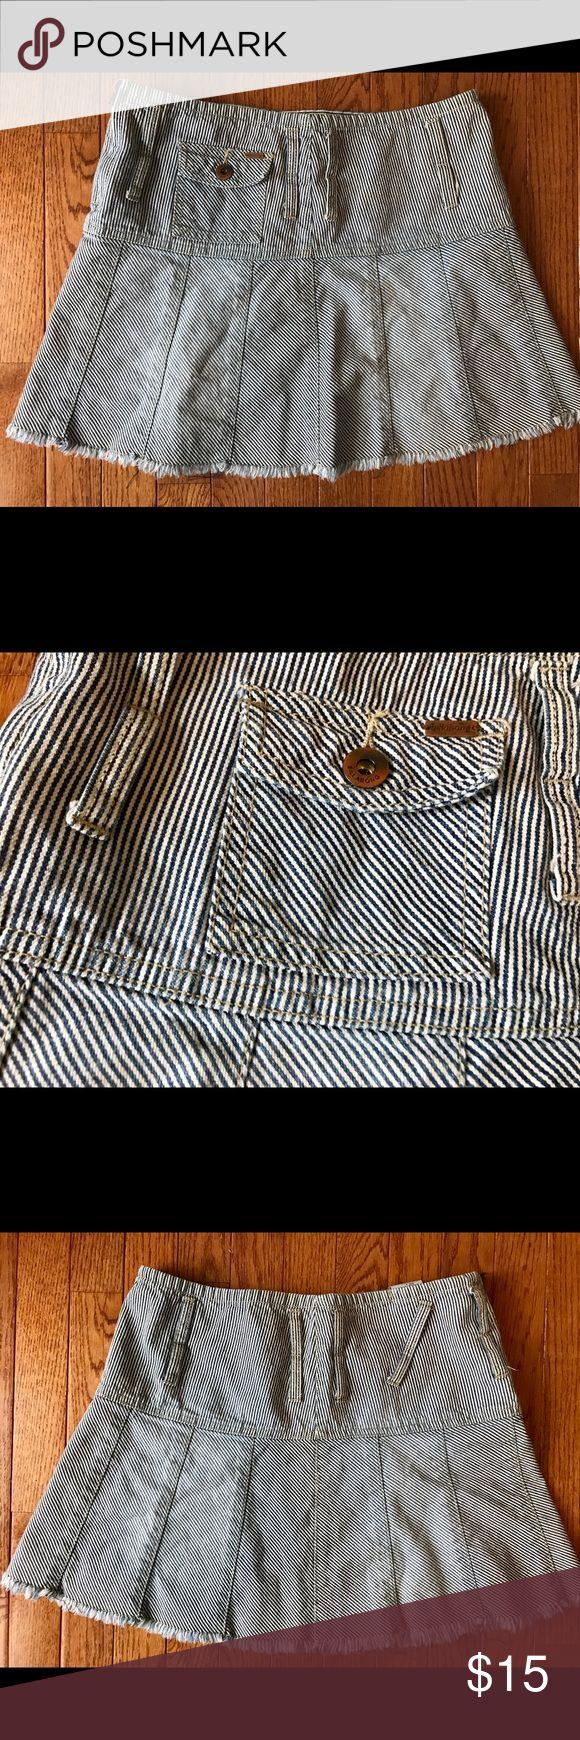 Billabong striped mini skirt Jean skirt, blue and white stripped. Billabong Skirts Mini